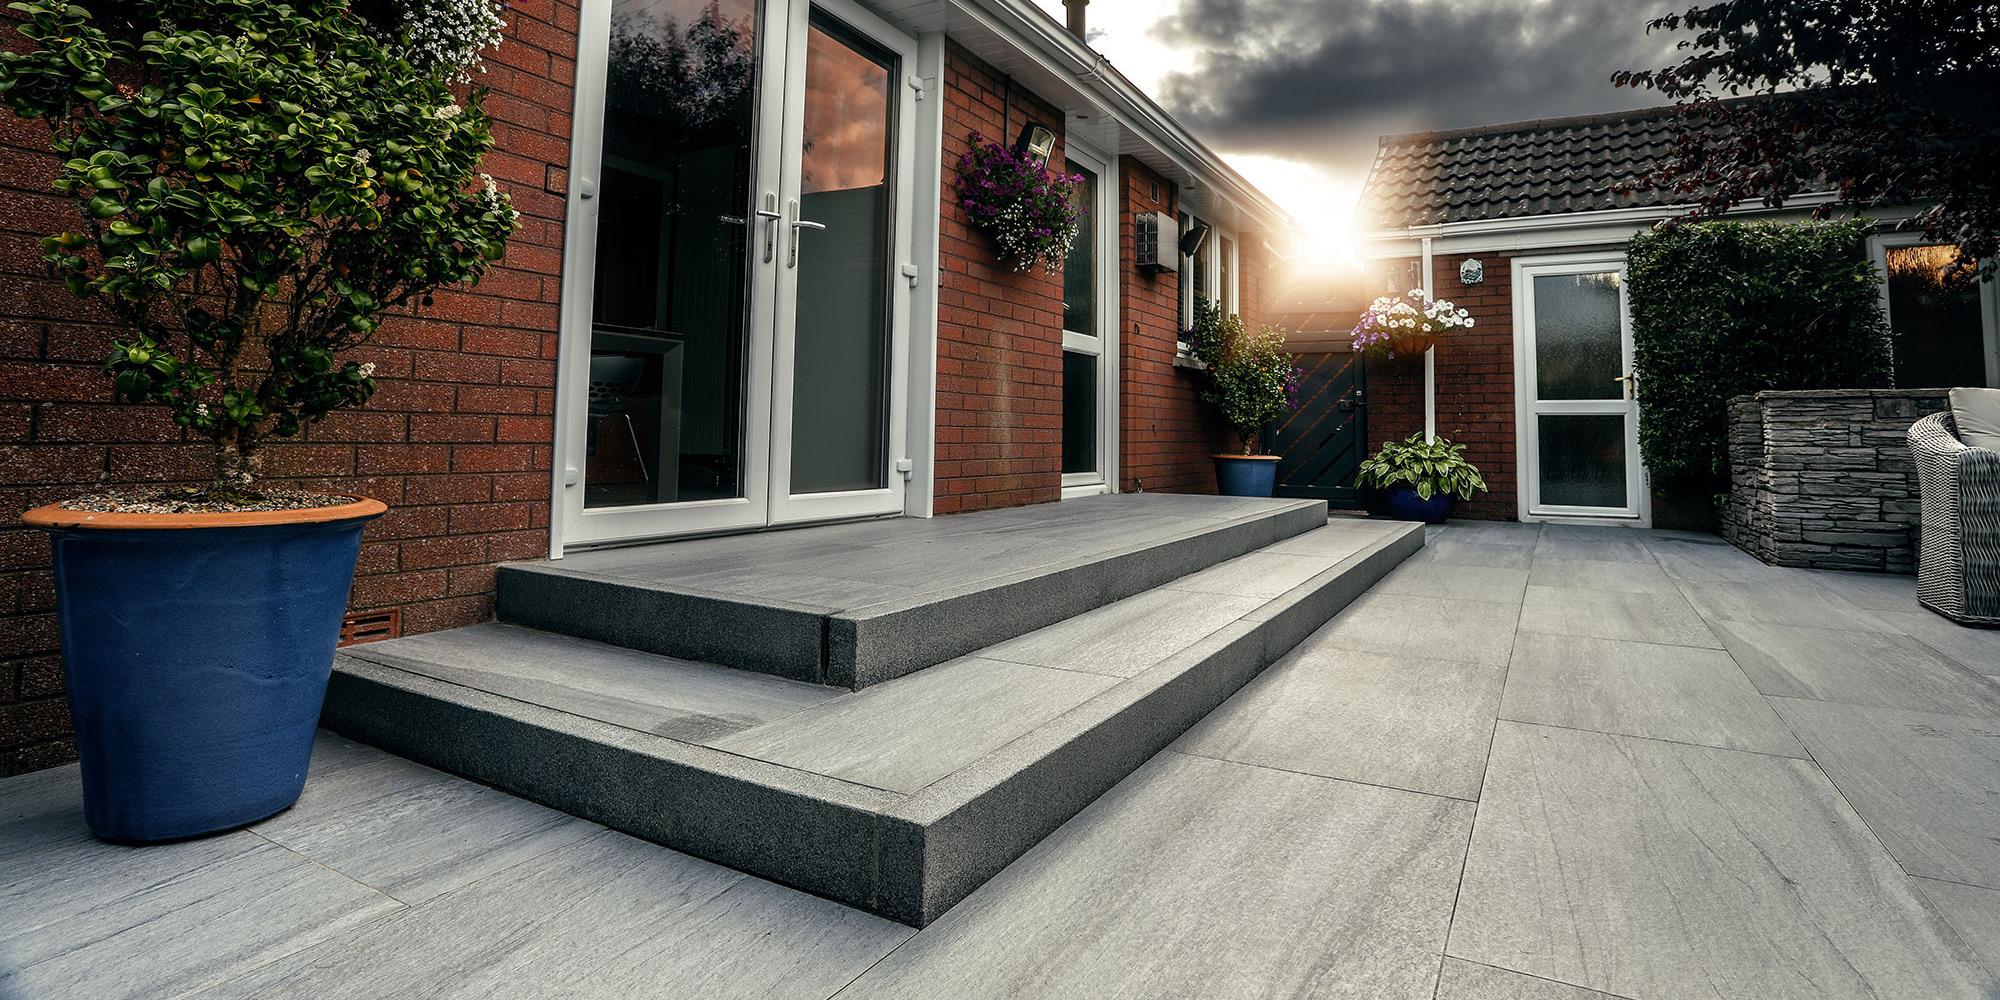 Granite paving northern ireland natural stone steps patios driveways